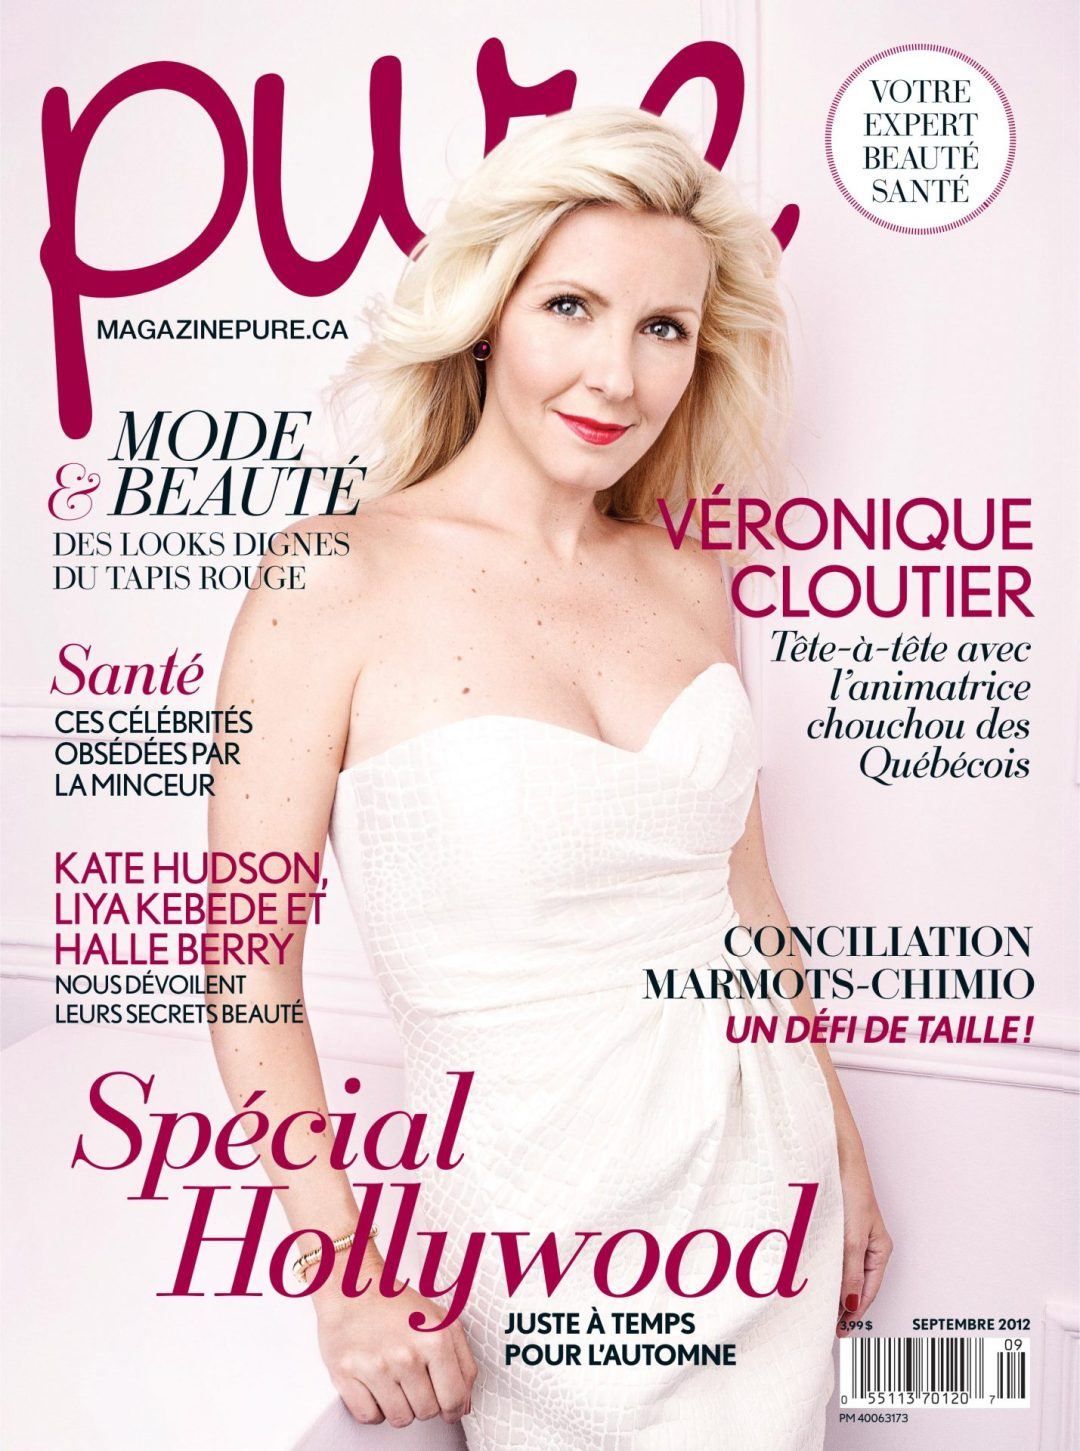 Magazine Pure Veronique Cloutier 2012 par Ariane Simard